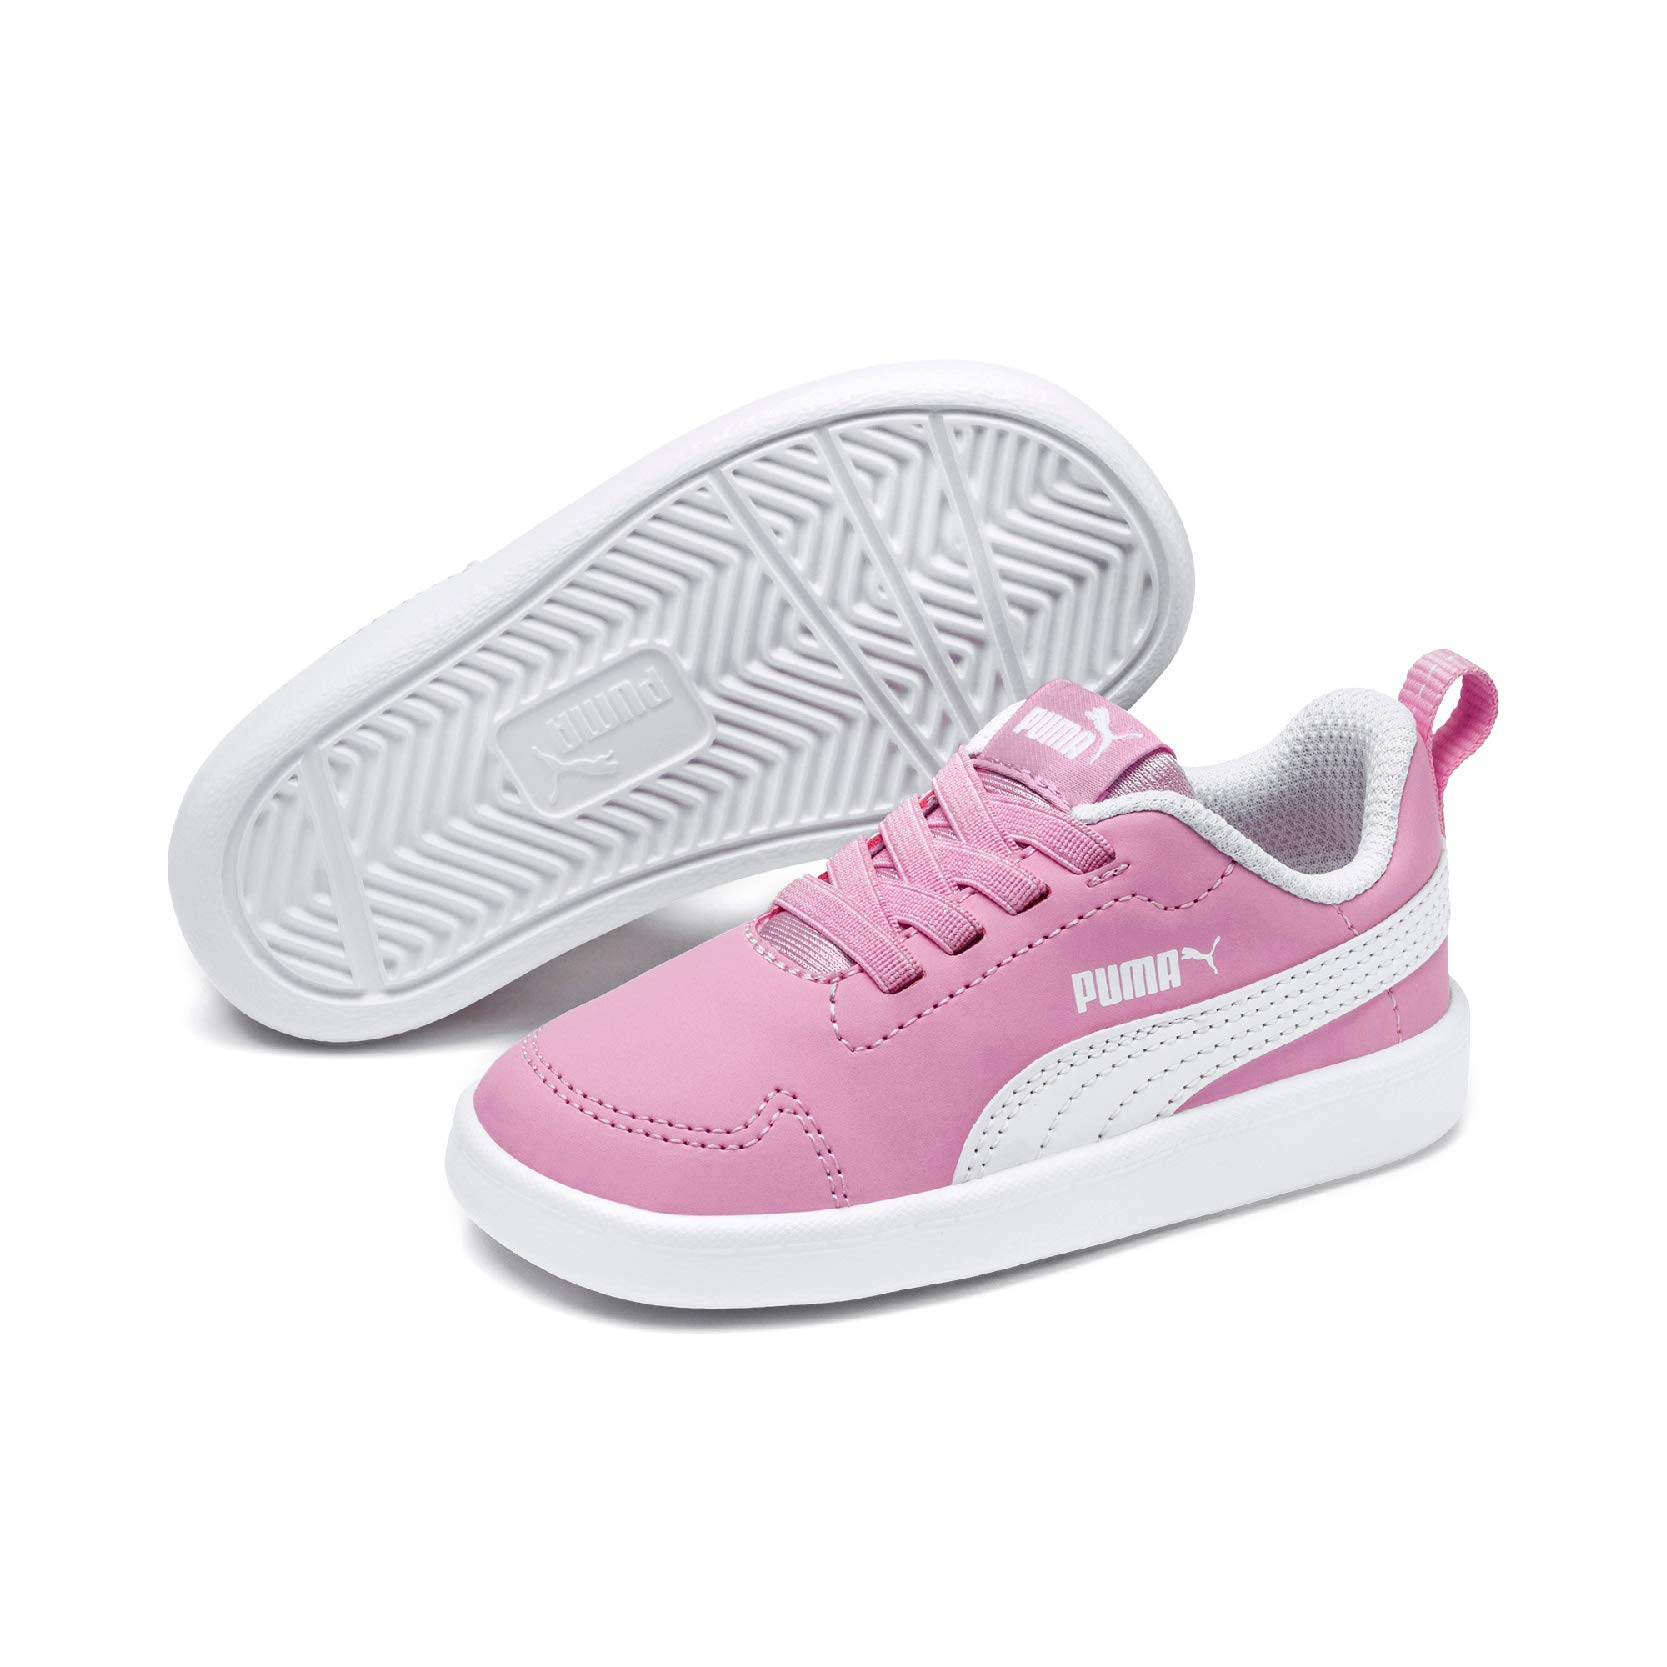 befd681c6 Mejor valorados en Zapatillas para niña   Opiniones útiles de ...